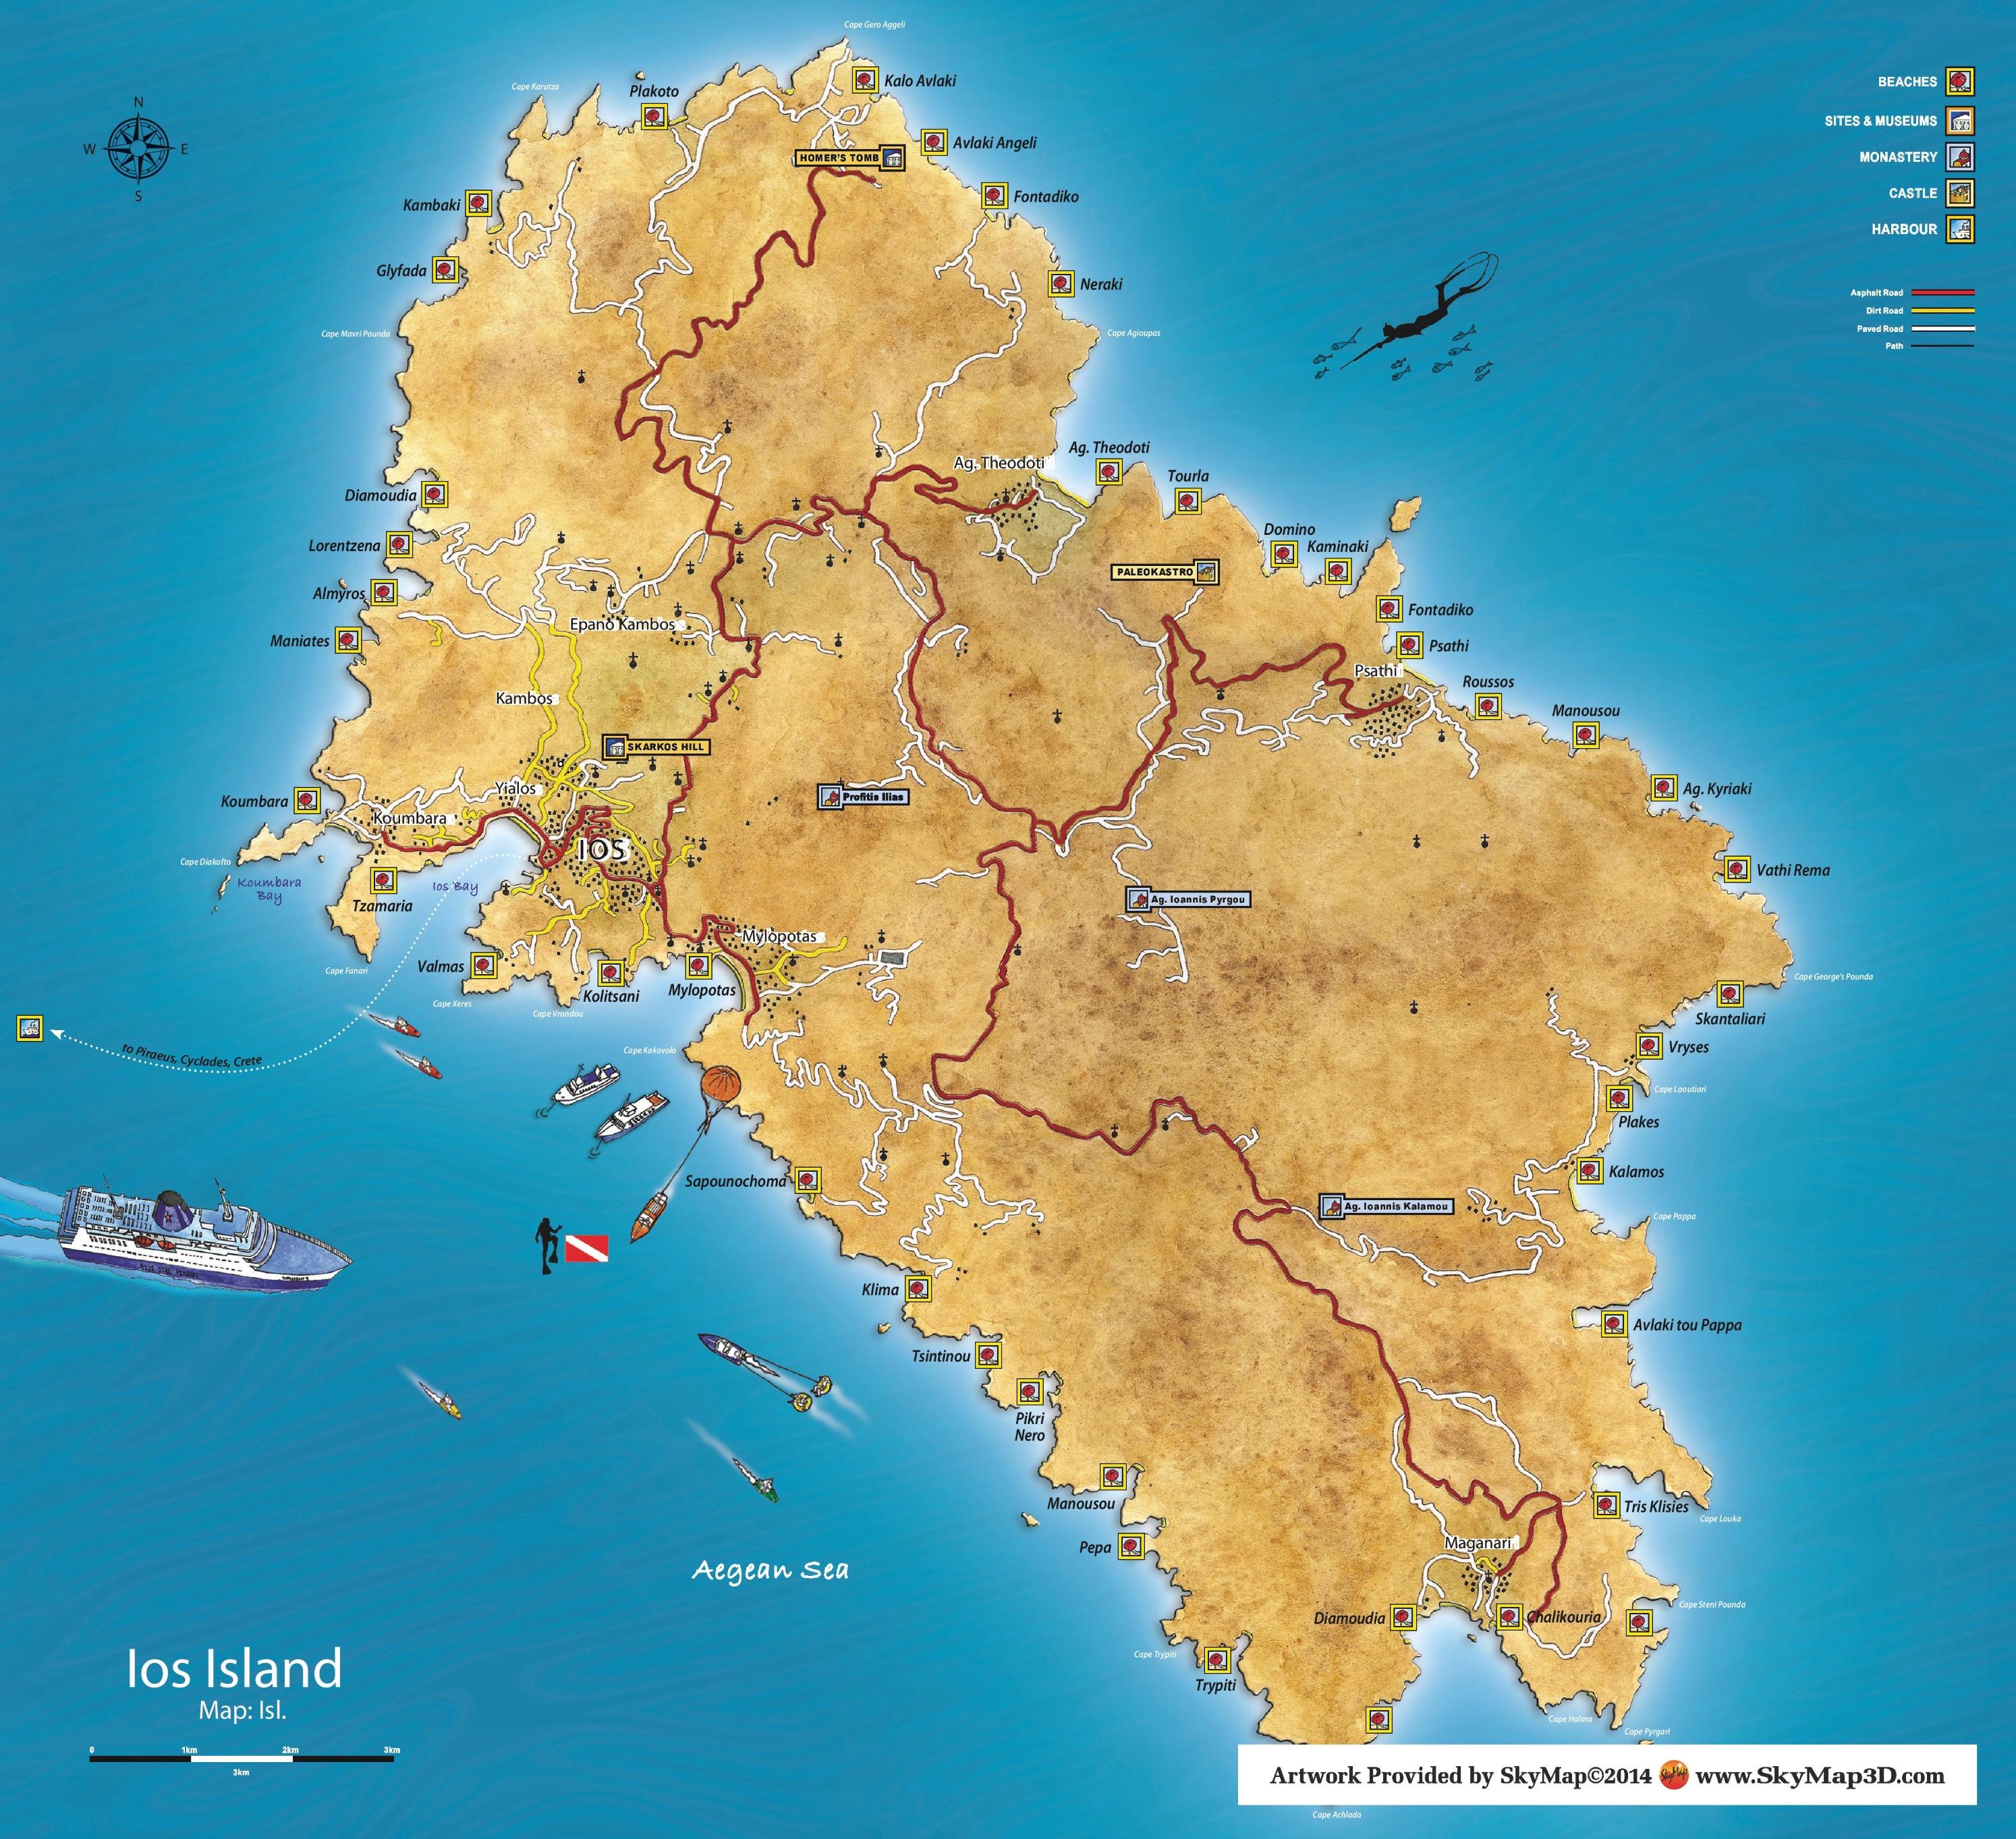 Ios island tourist map